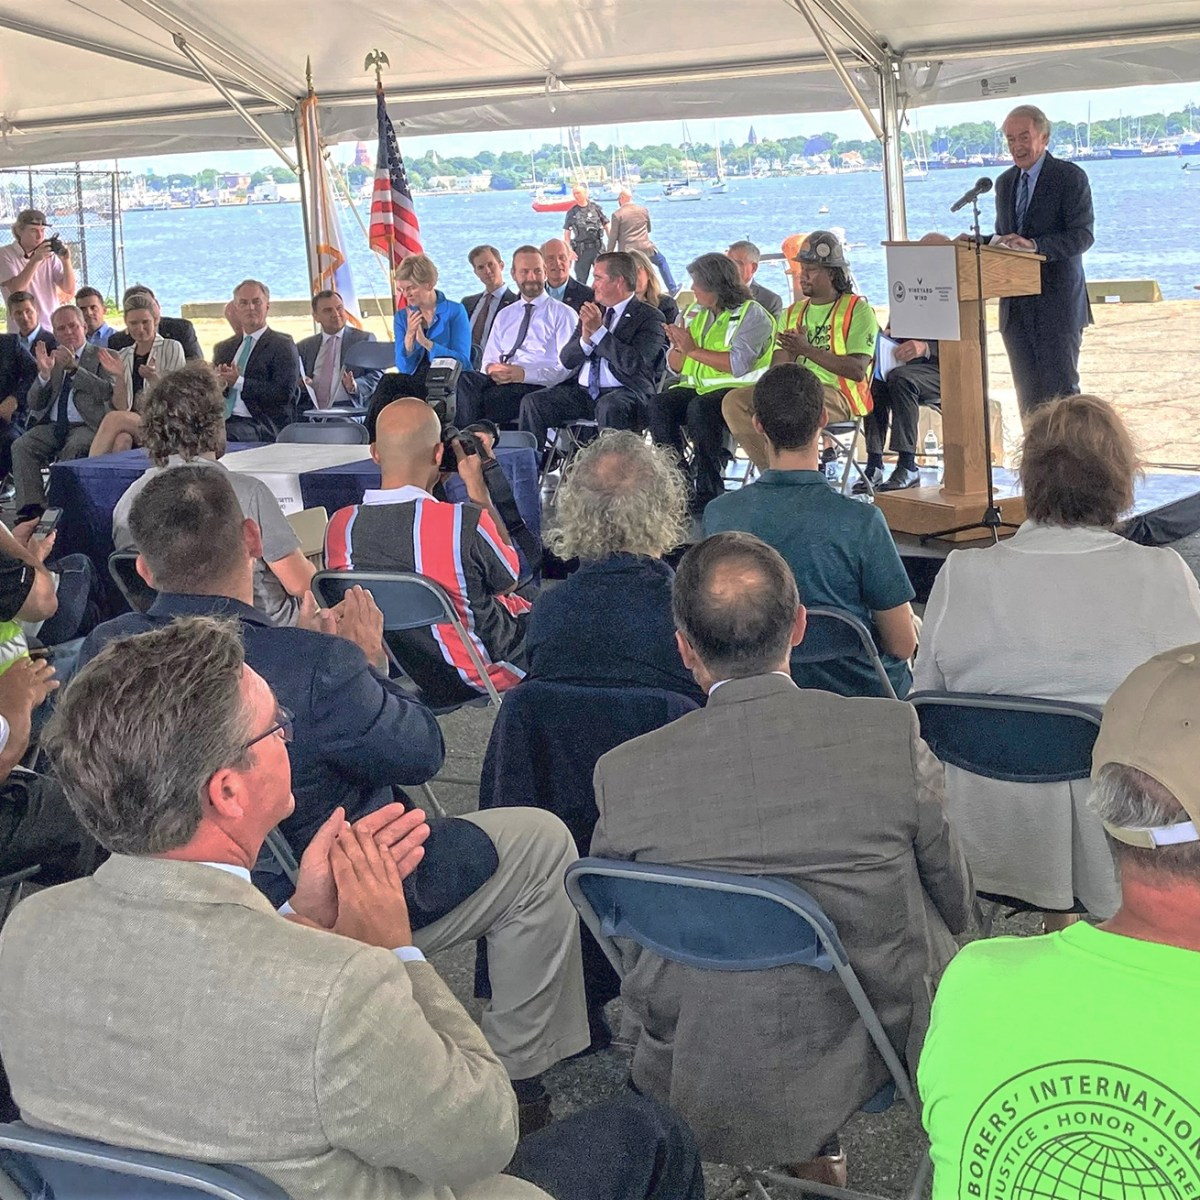 U.S. Sen. Ed Markey at podium under tent at Marine Commerce Terminal in New Bedford.